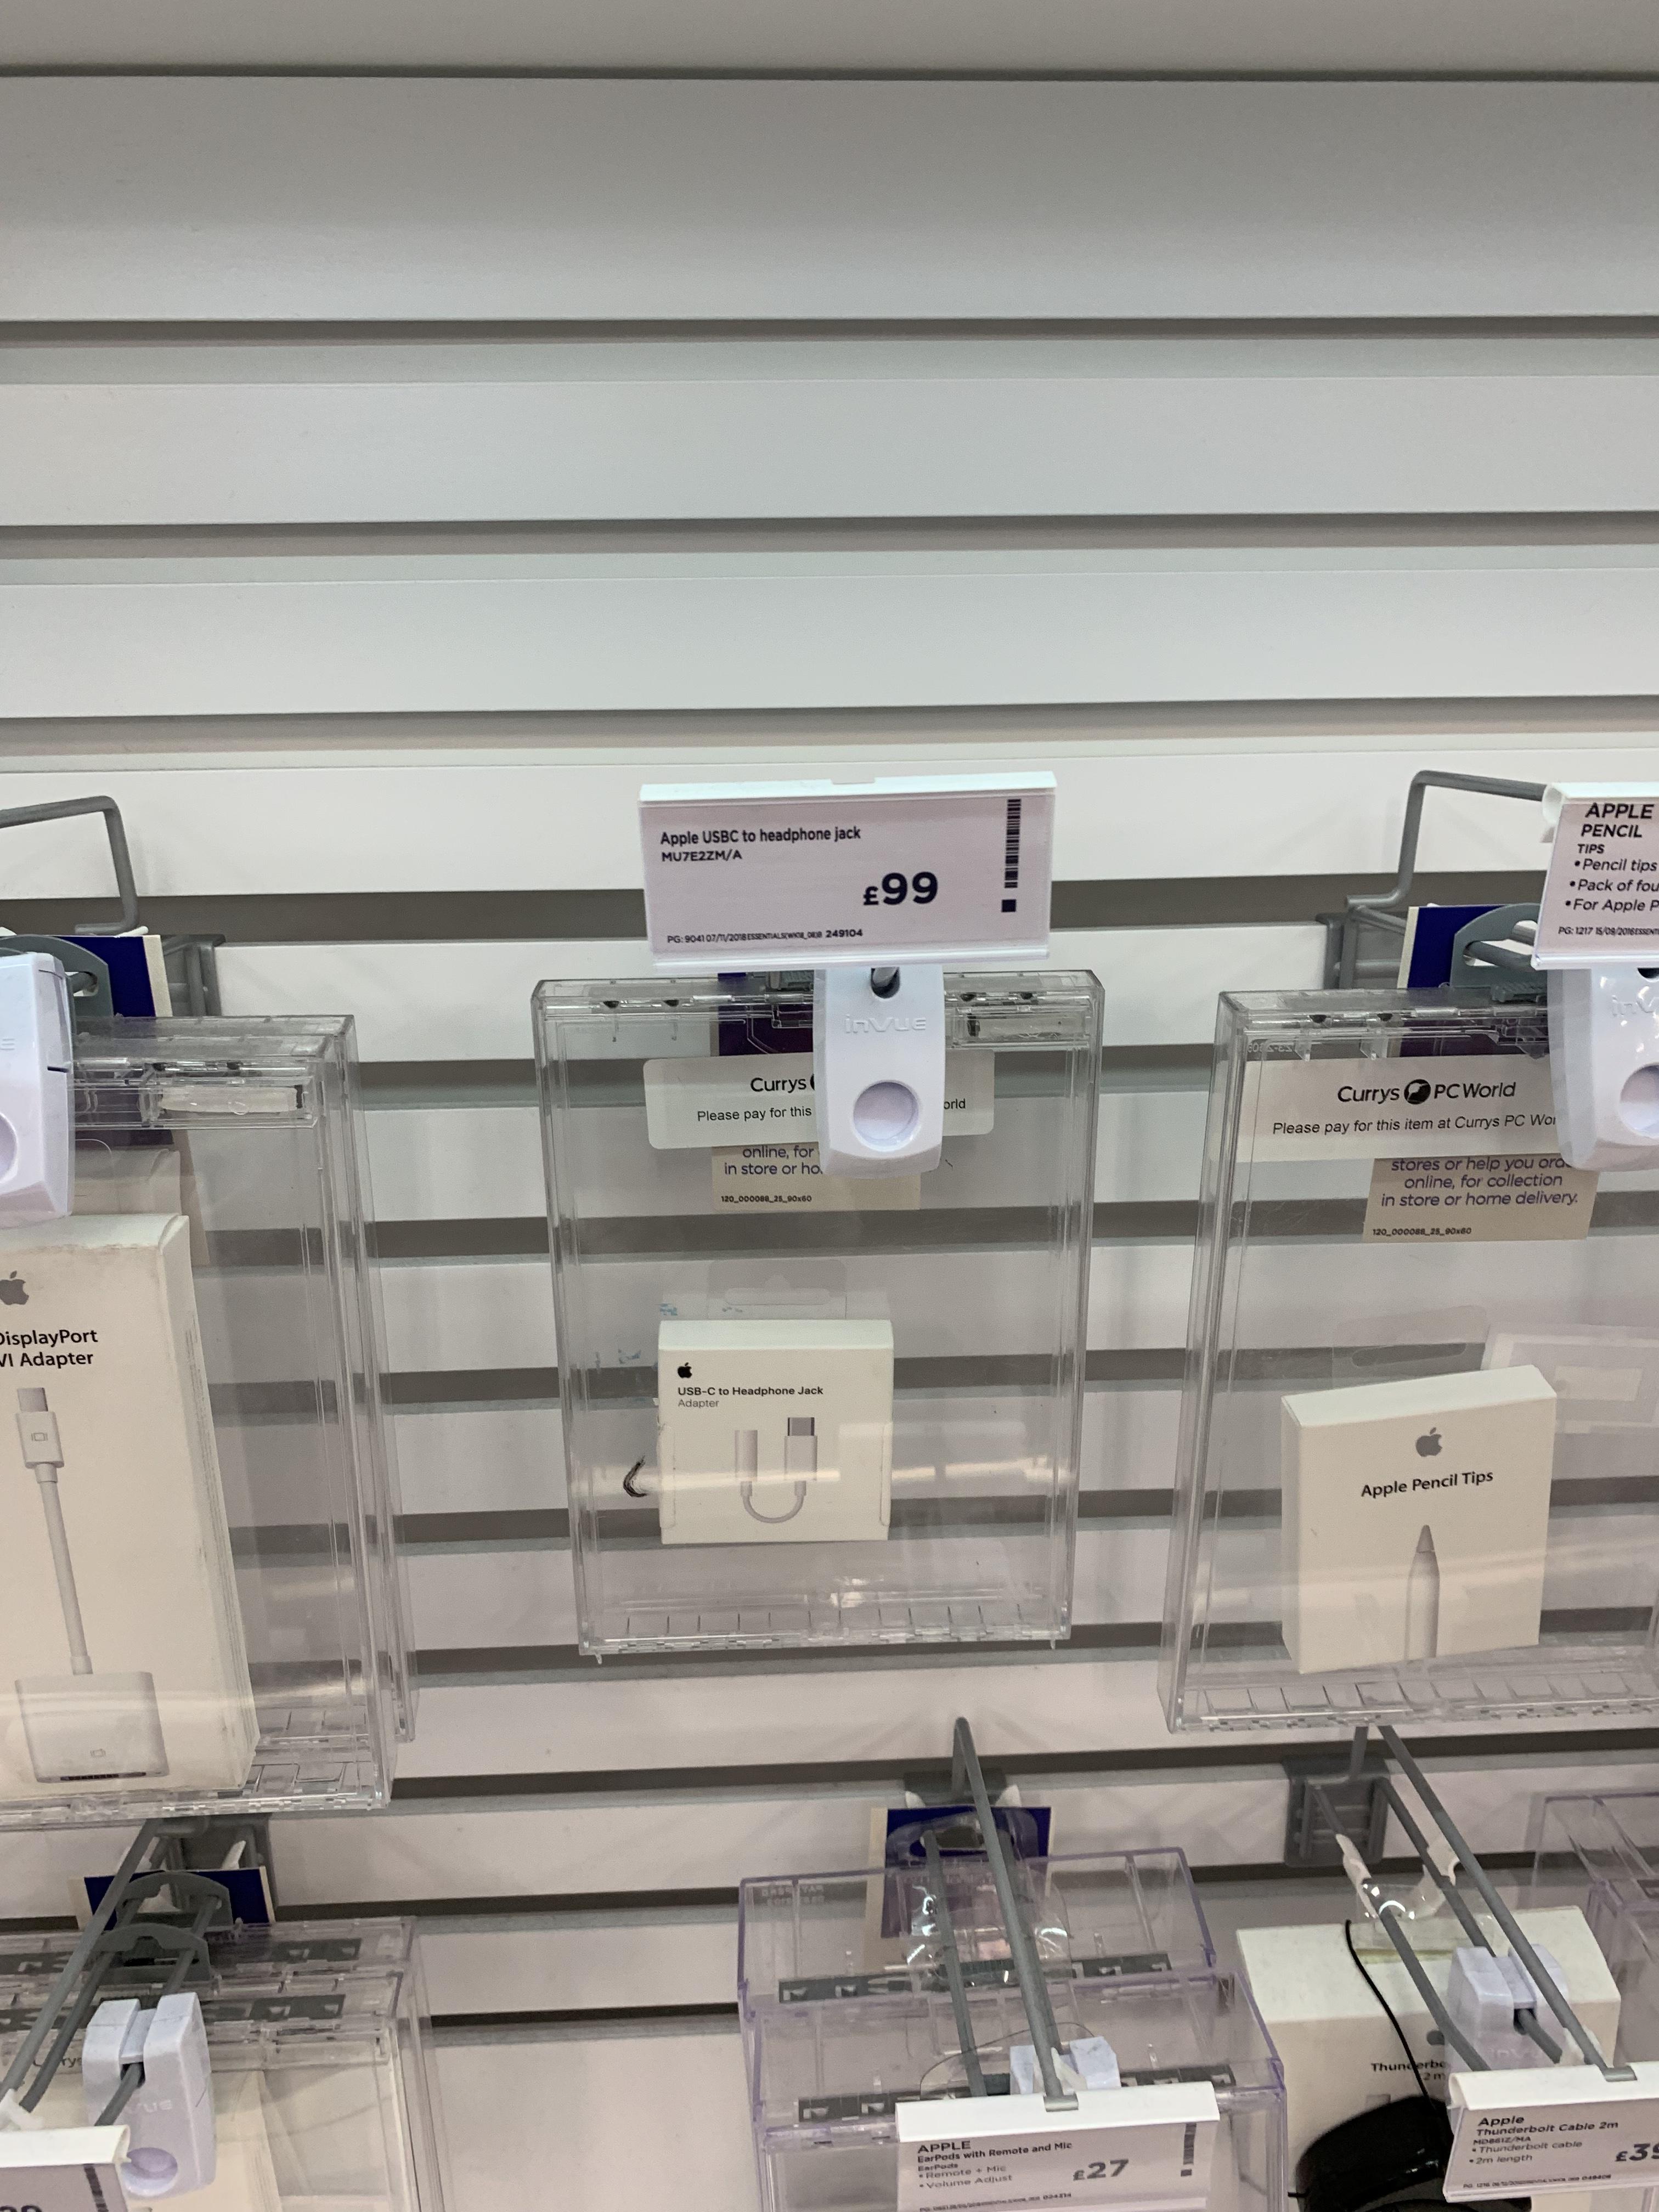 Apple Usb C To Headphone Jack 99 Tesco Kingston Milton Keynes